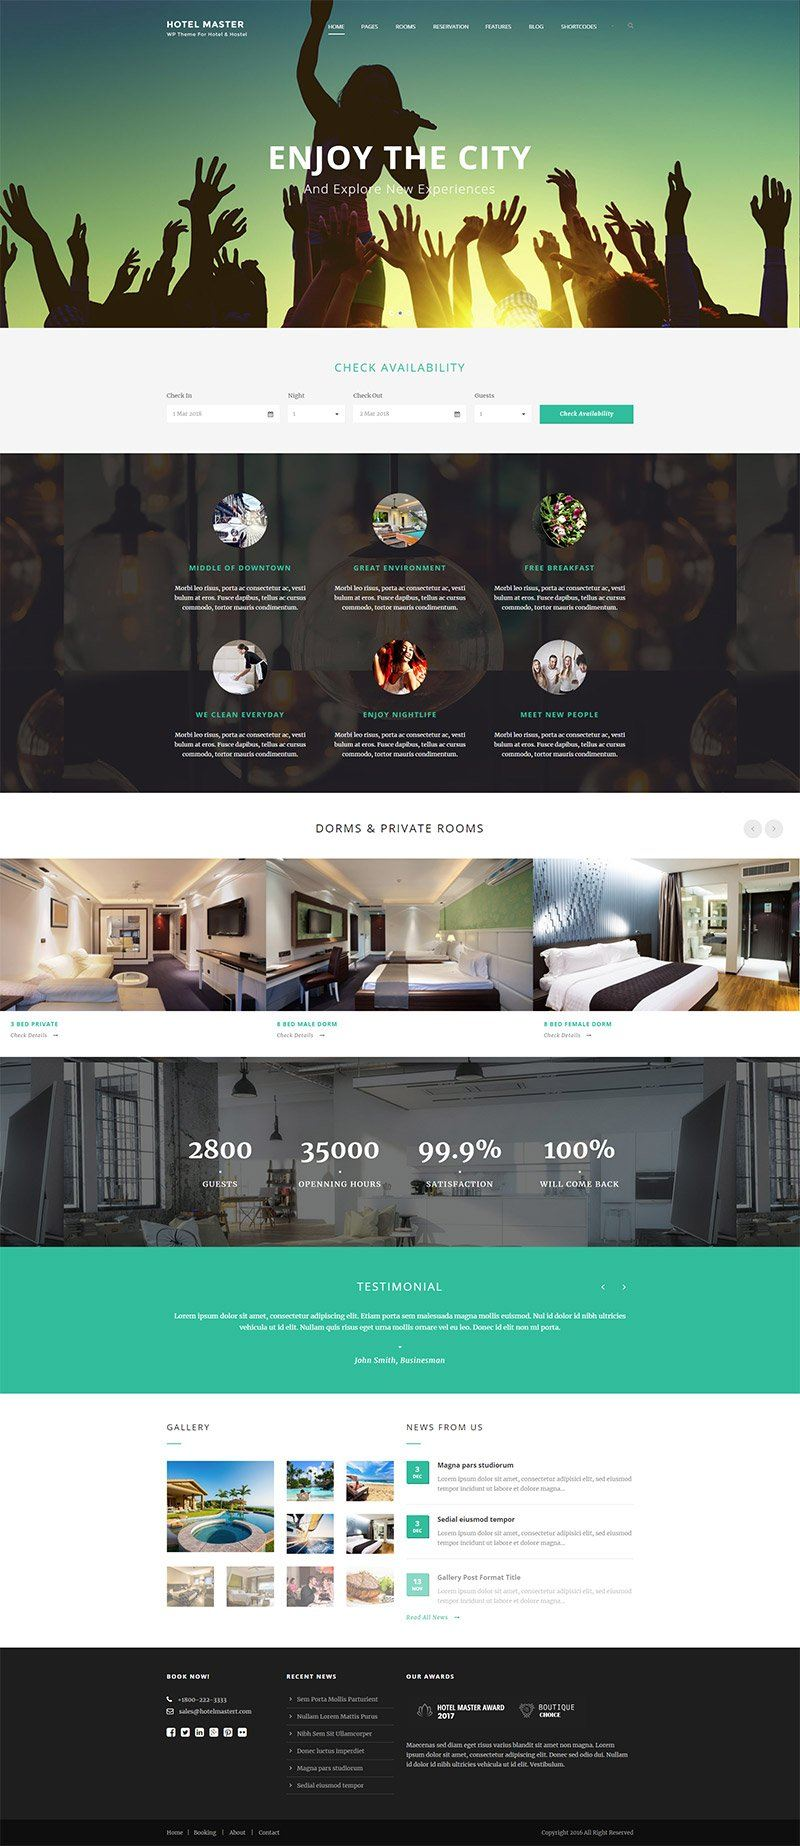 Giao-dien-website-khach-san-hotel-master